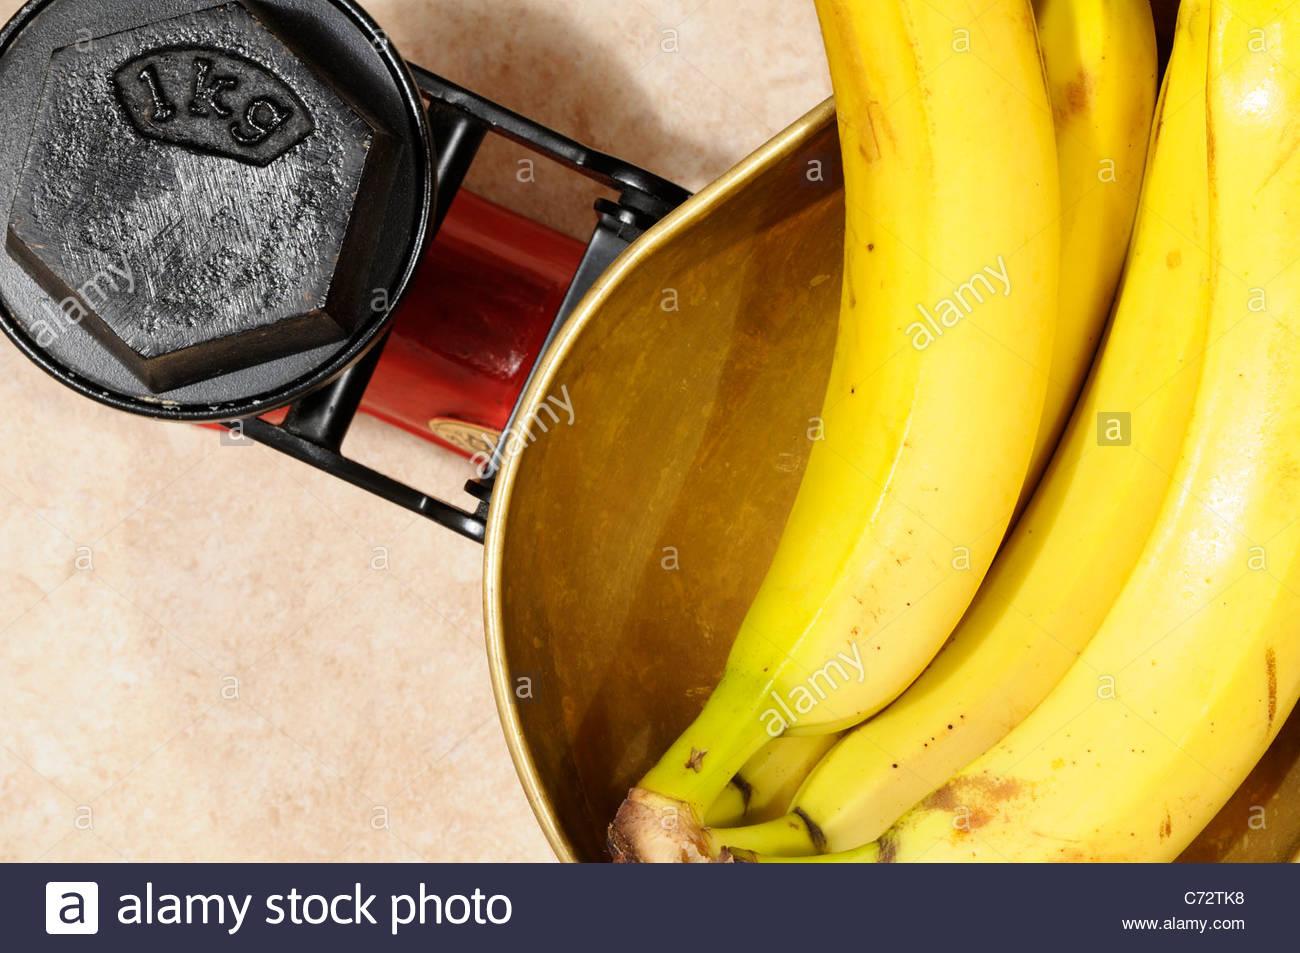 Bananas on Kitchen scales 1kg, England - Stock Image